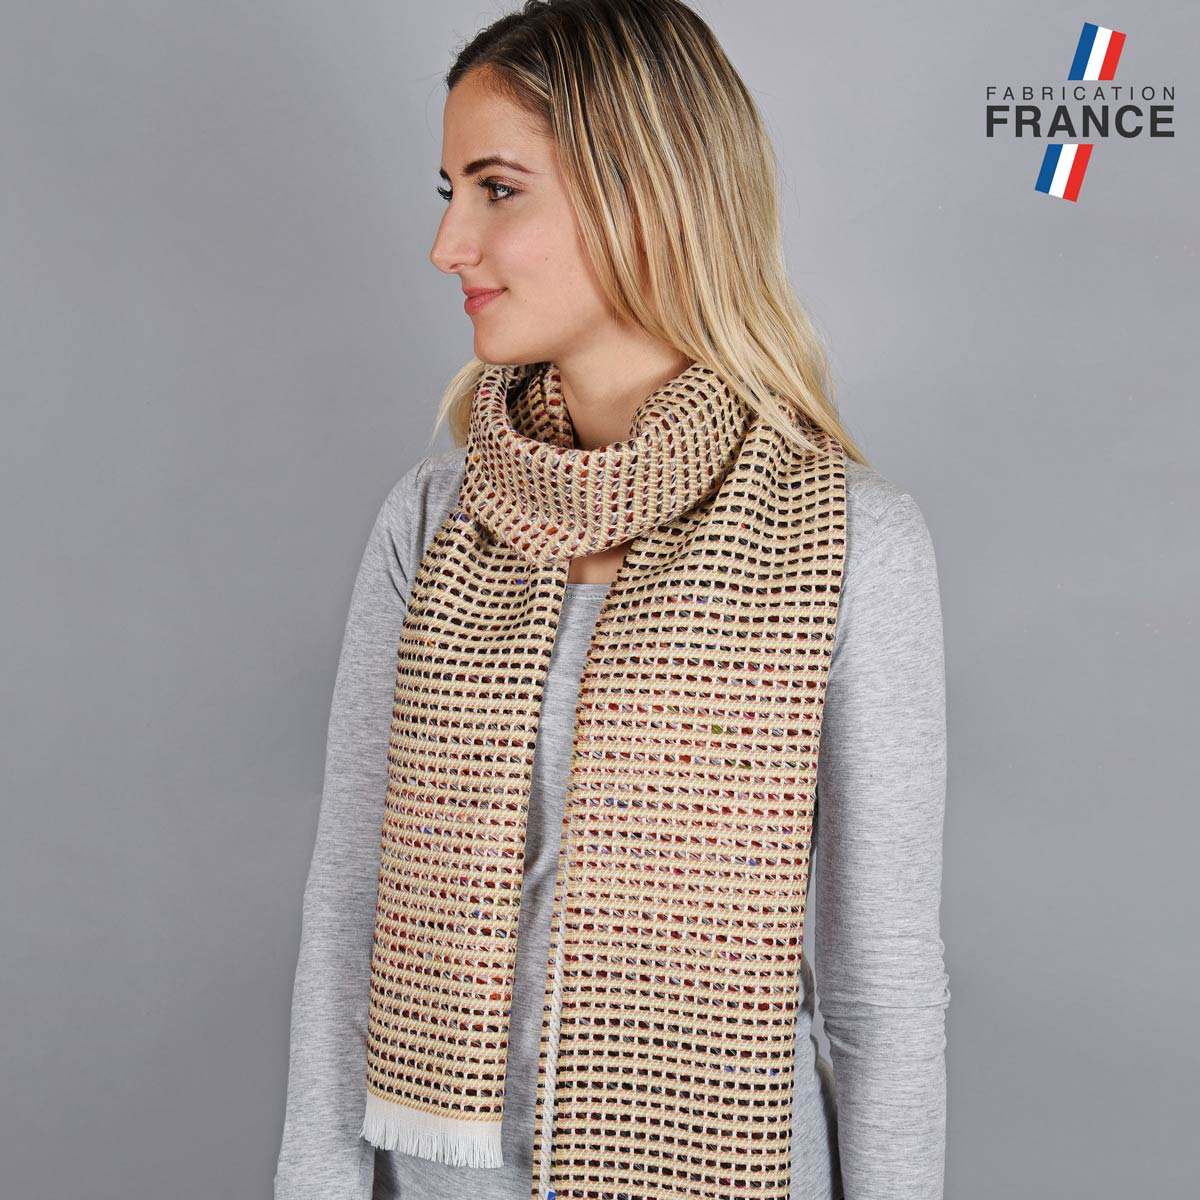 AT-05580_W12-1FR_Echarpe-femme-beige-fabrication-francaise